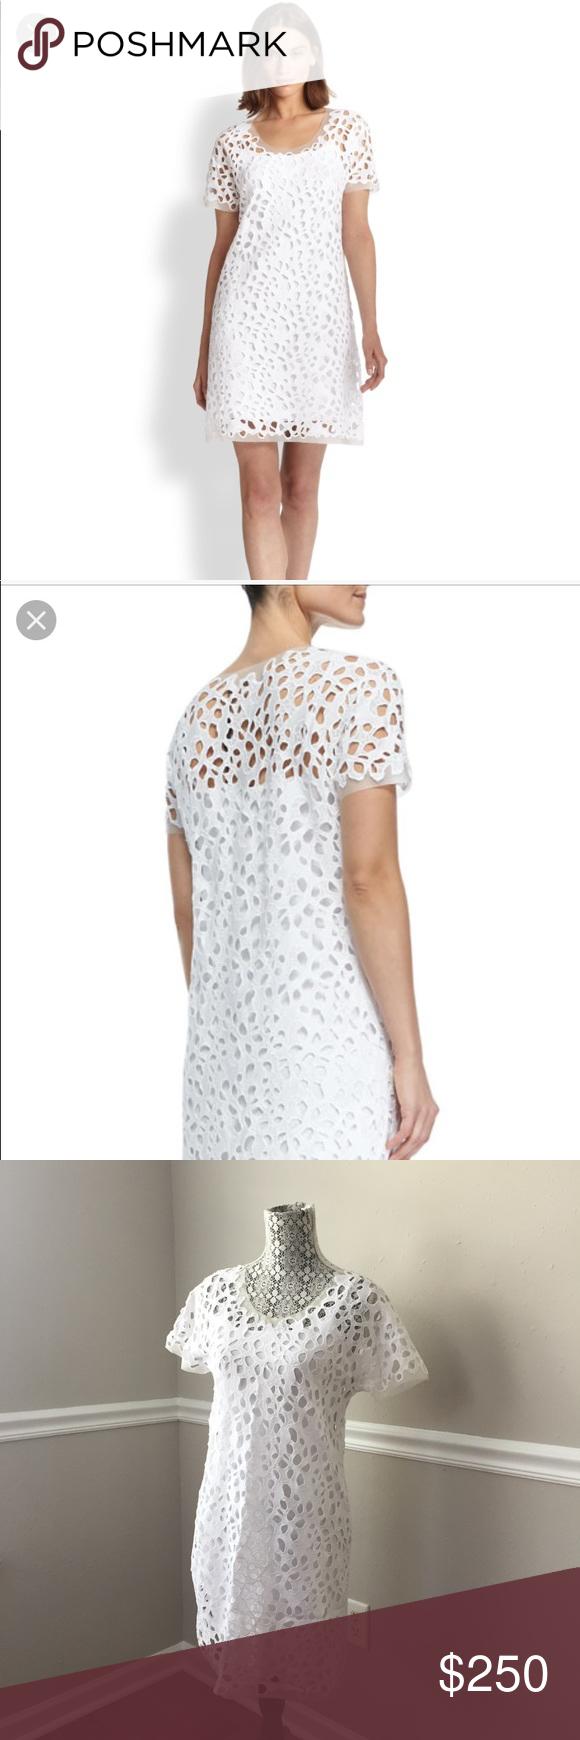 Elie Tahari Maissa Lace Dress In White Gorgeous Brand New Lace Midi Dress Slip Dress With Adjustable Straps Underneath Per Lace Dress Lace Midi Dress Dresses [ 1740 x 580 Pixel ]